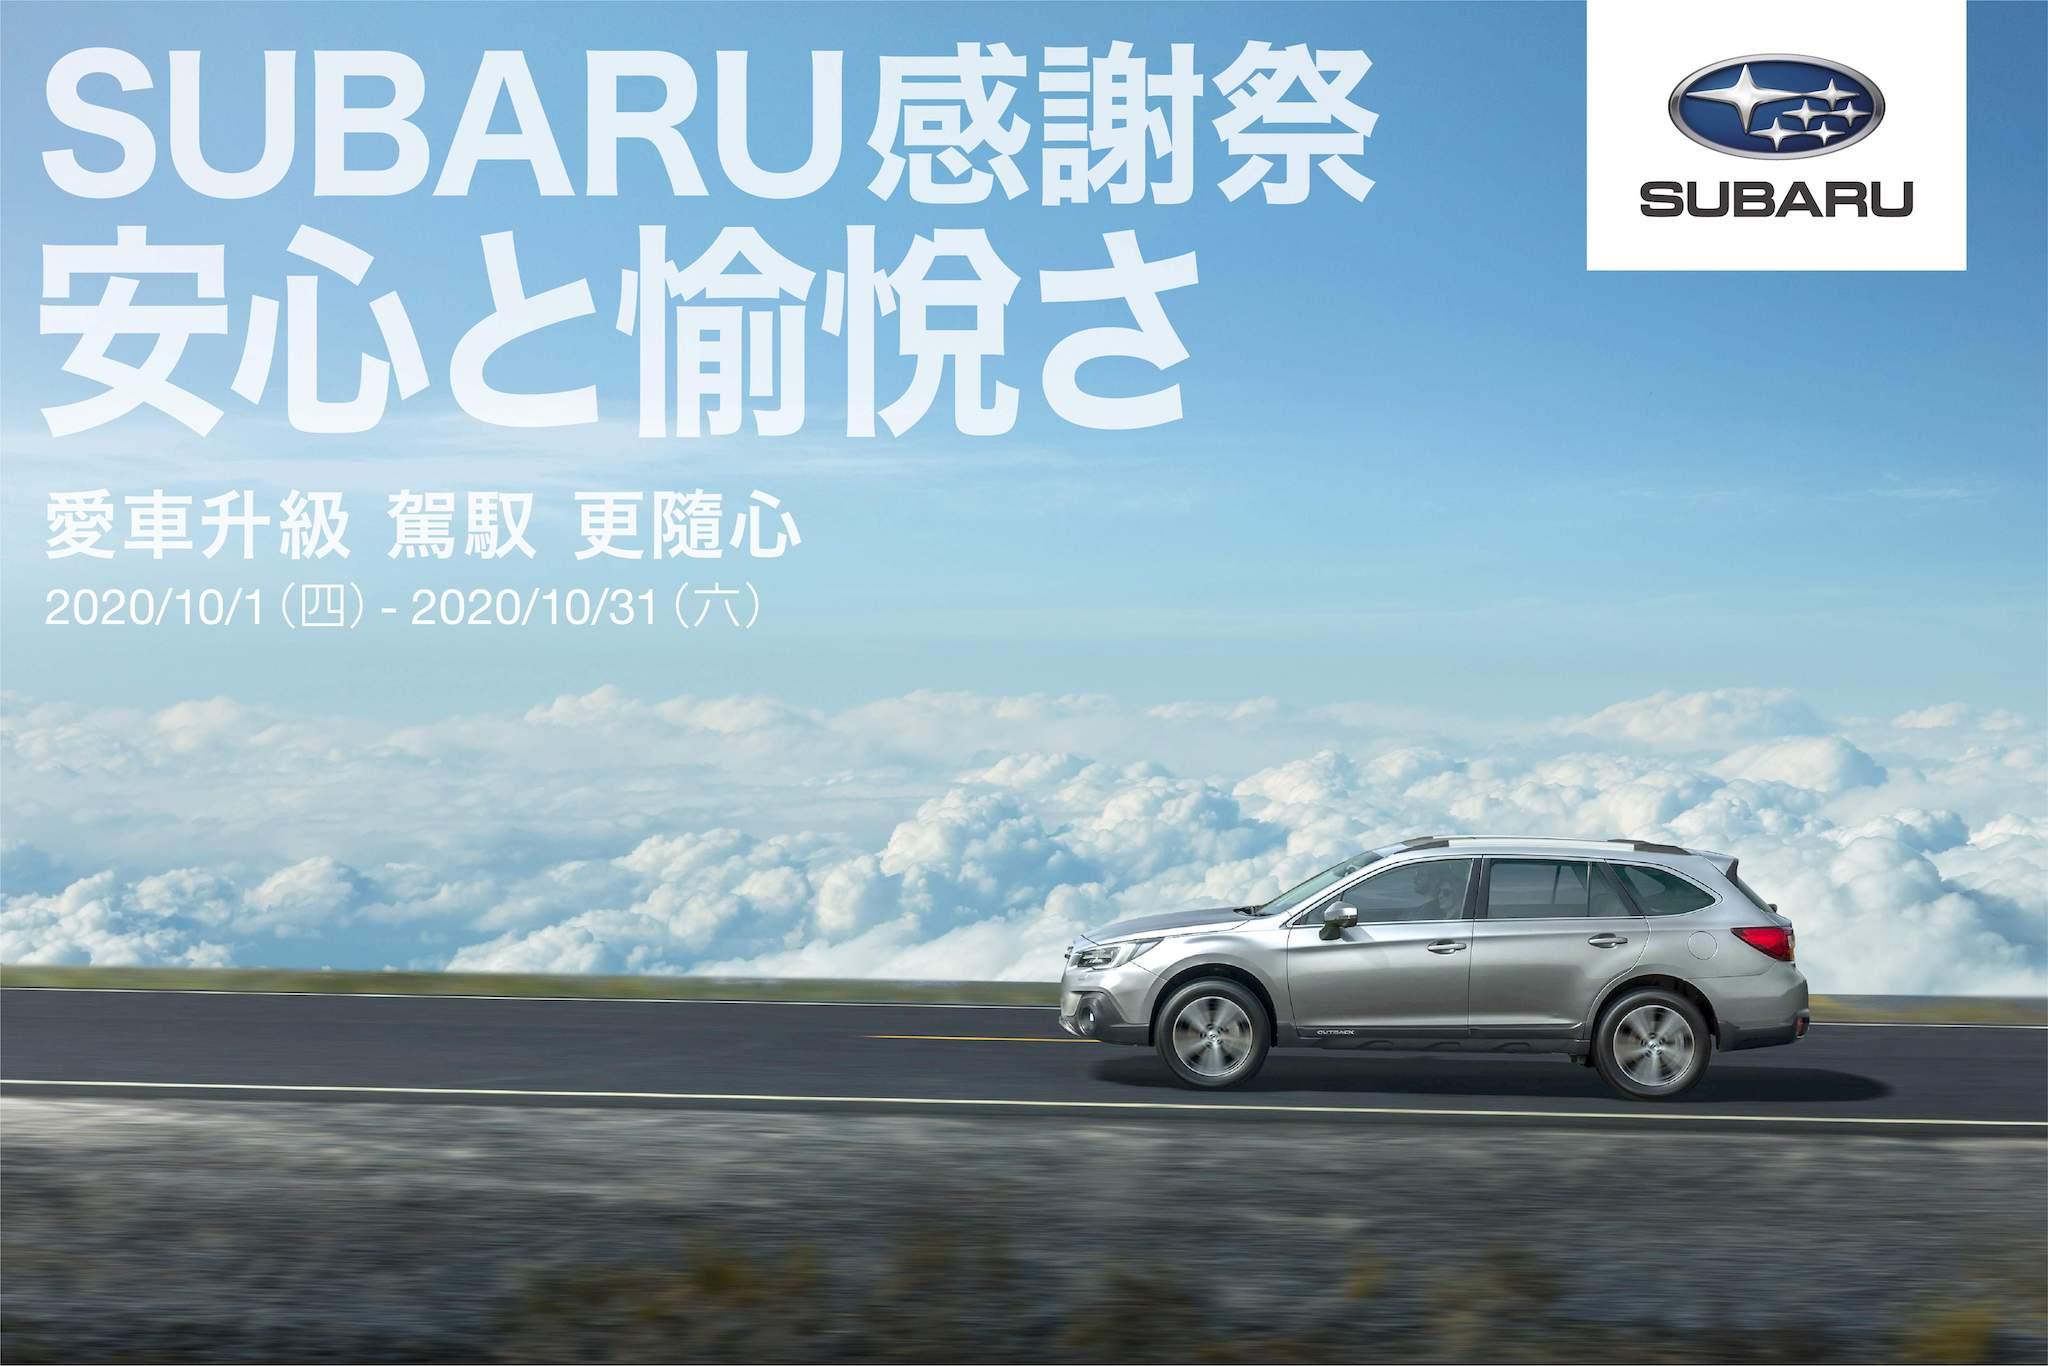 Subaru 推出感謝祭。